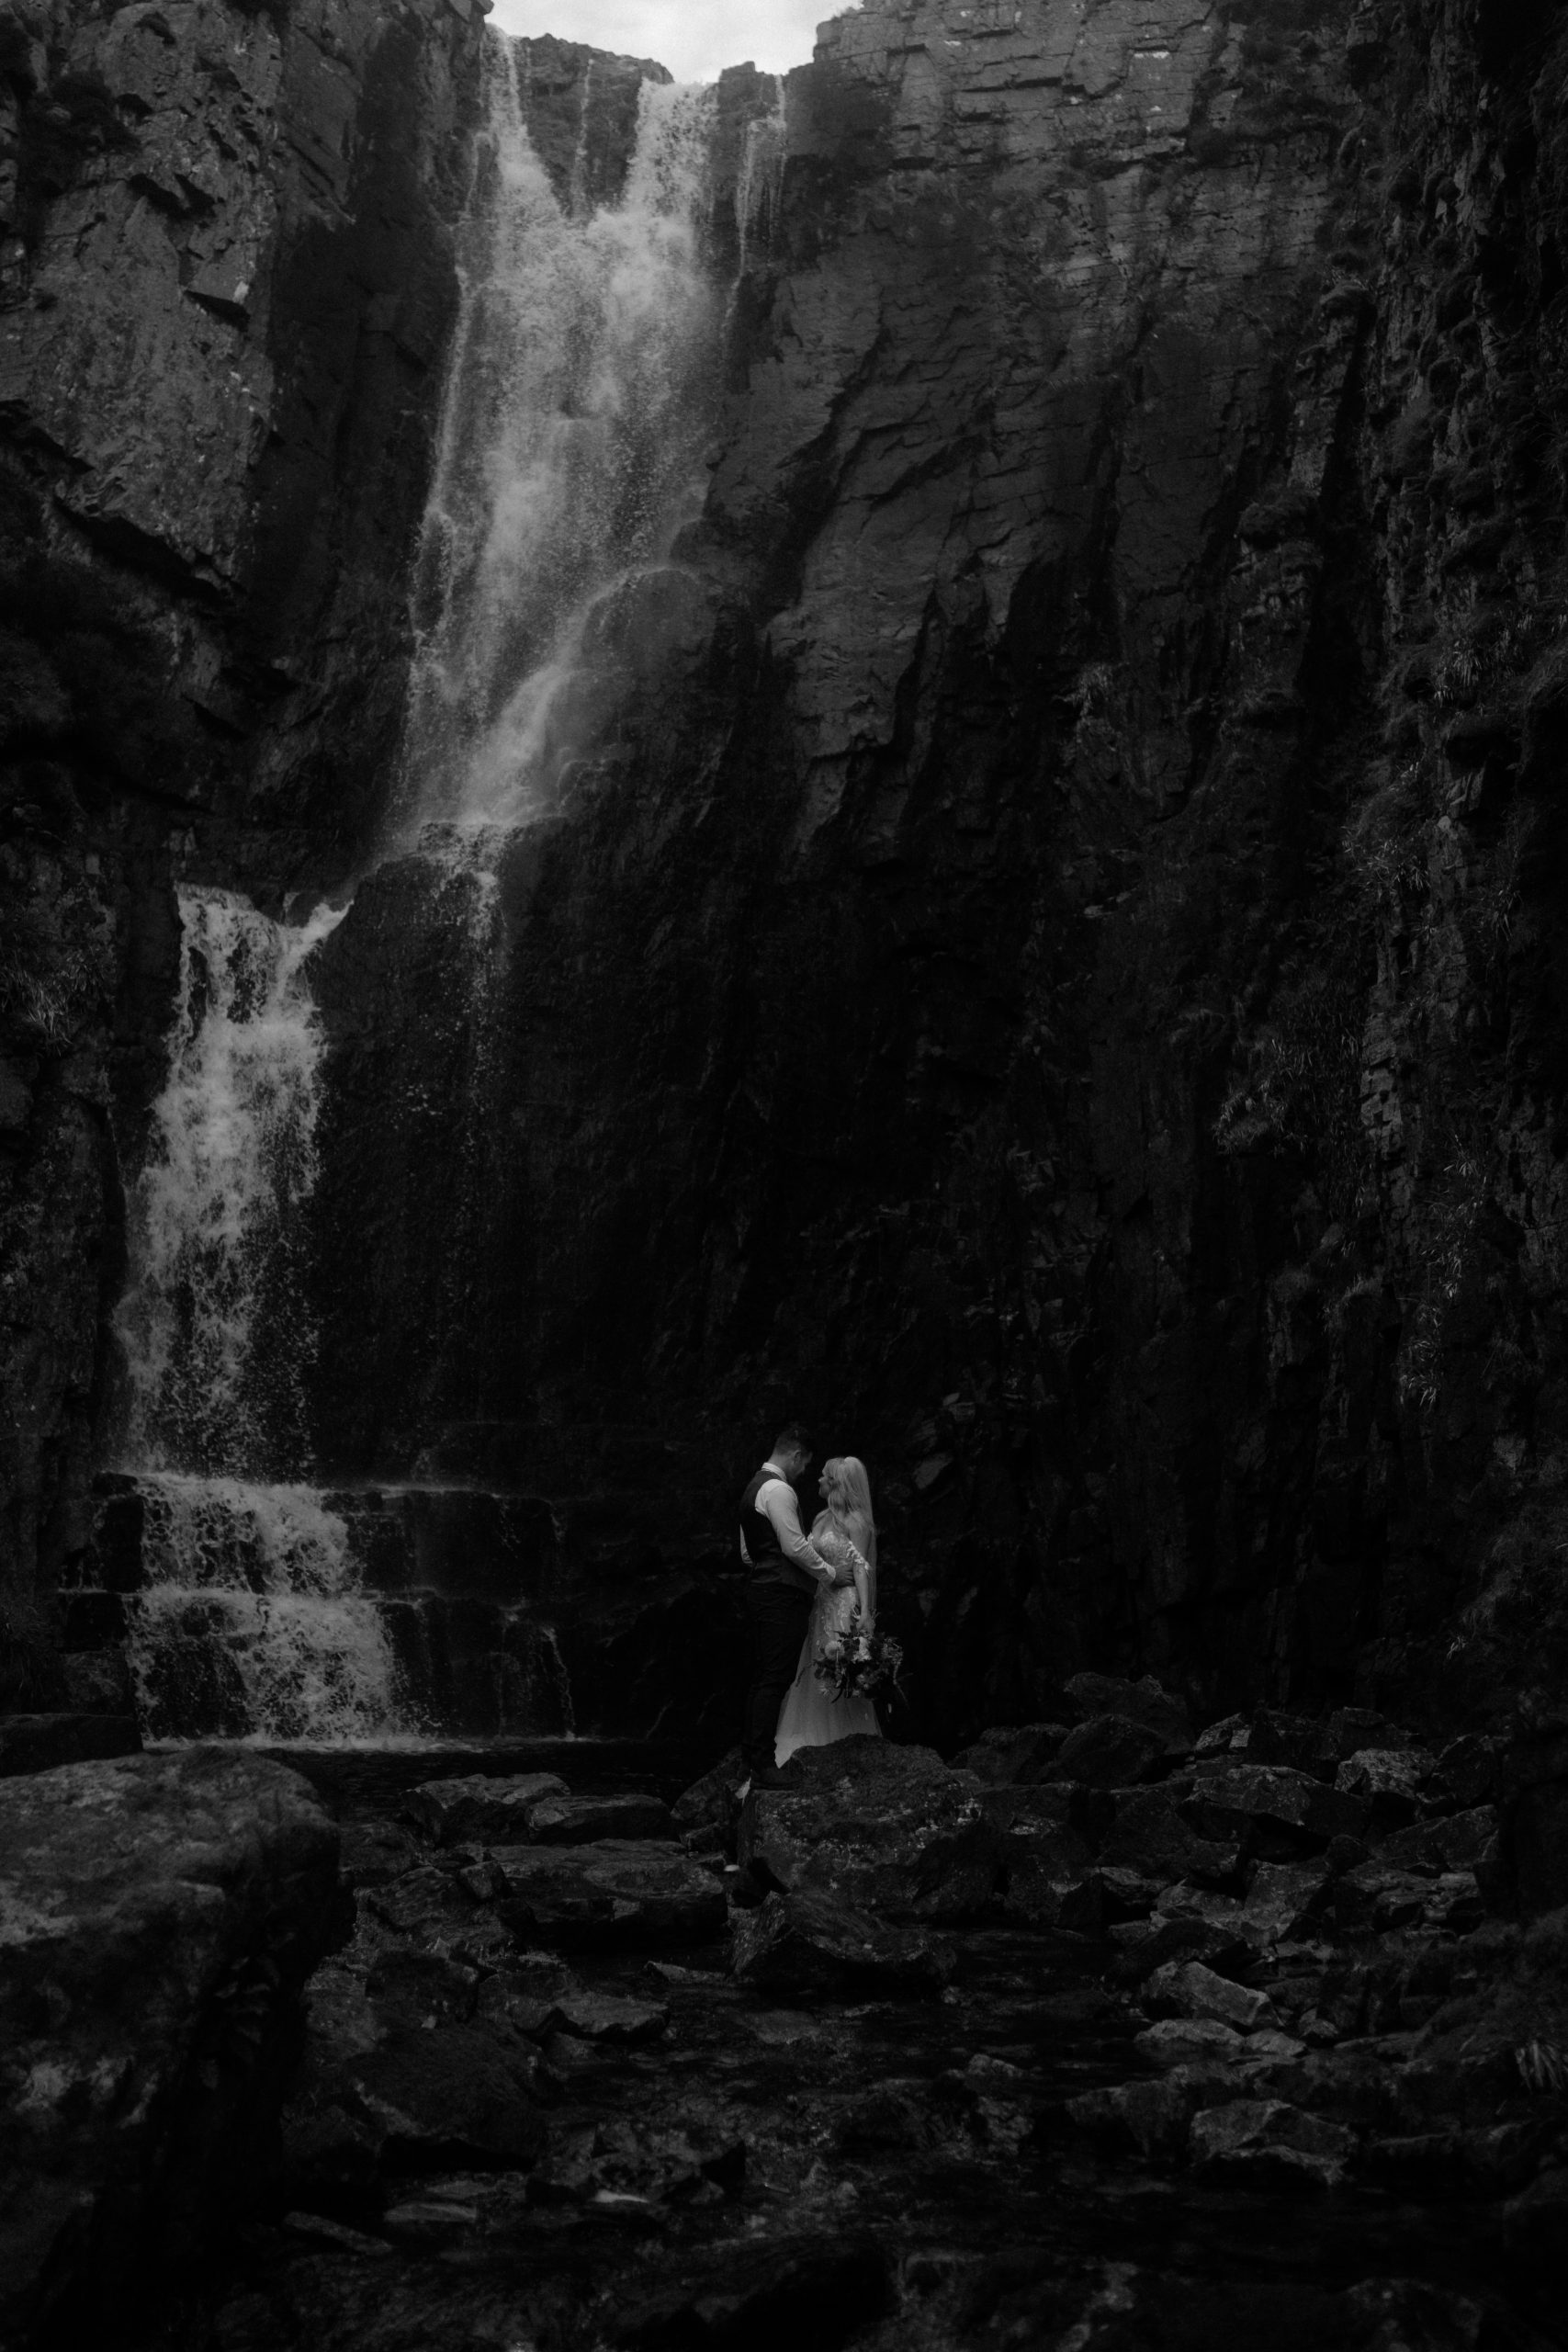 couple stood under Wailing Widow Falls, Assynt